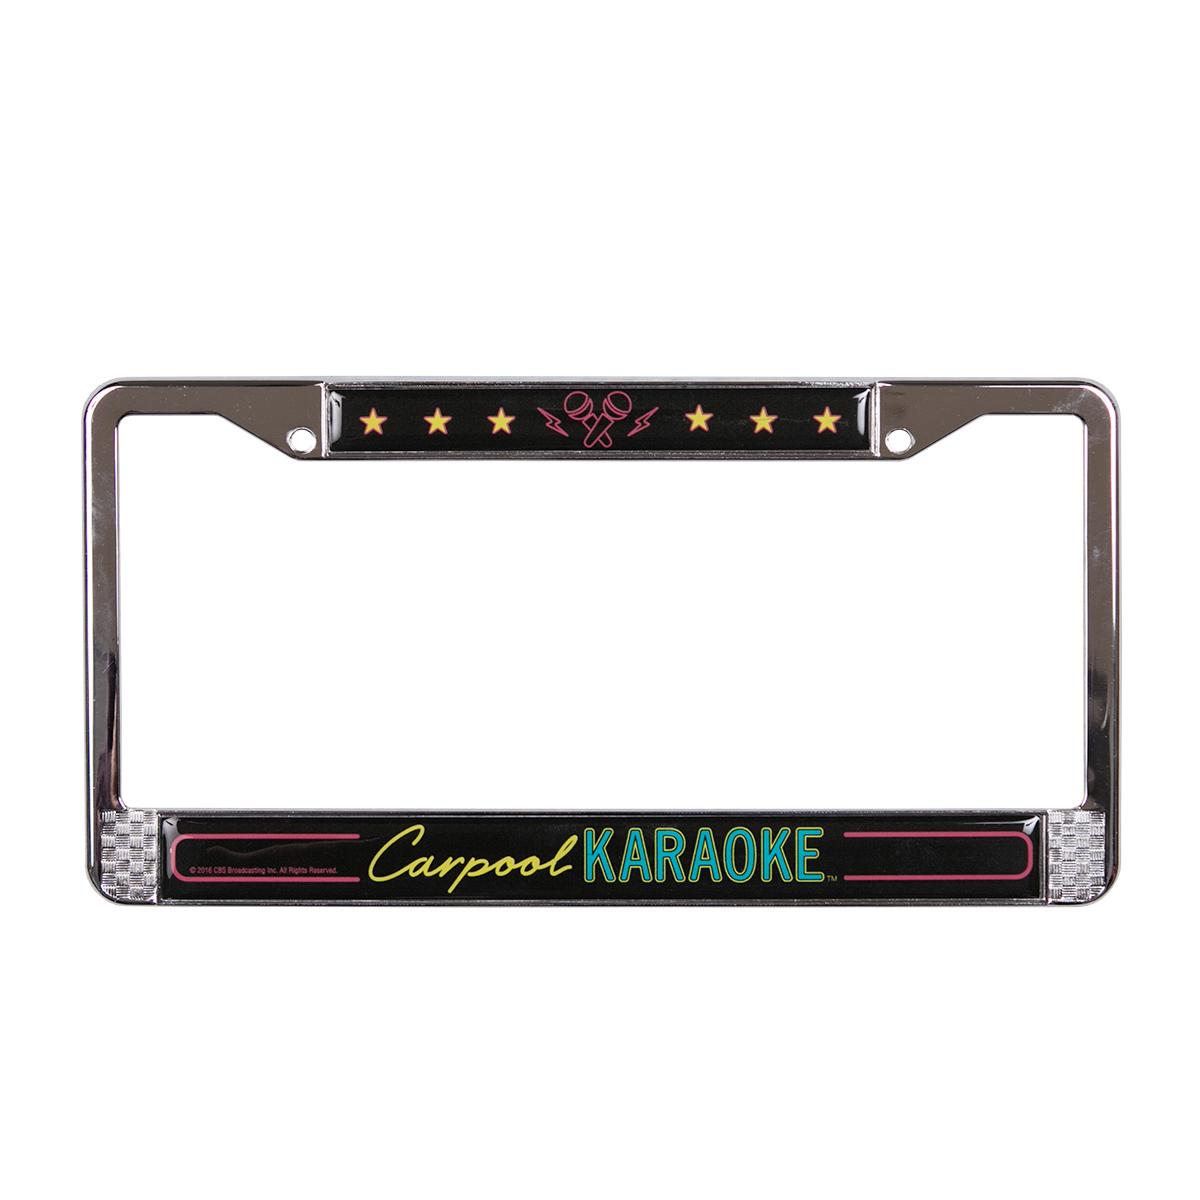 The Late Late Show with James Cordon Carpool Karaoke License Plate Fram